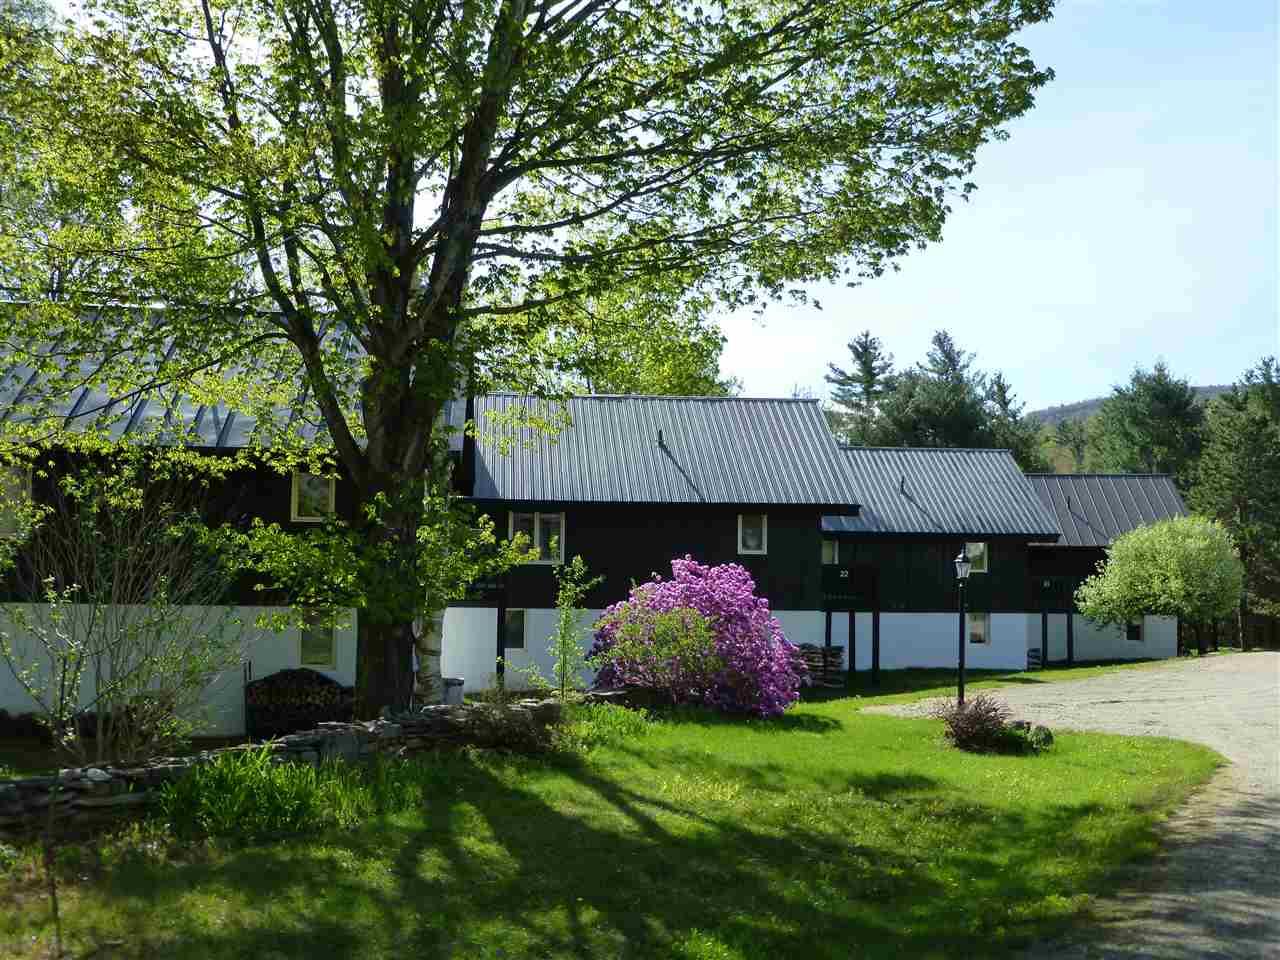 Mount-Snow-Real-Estate-4634315-2